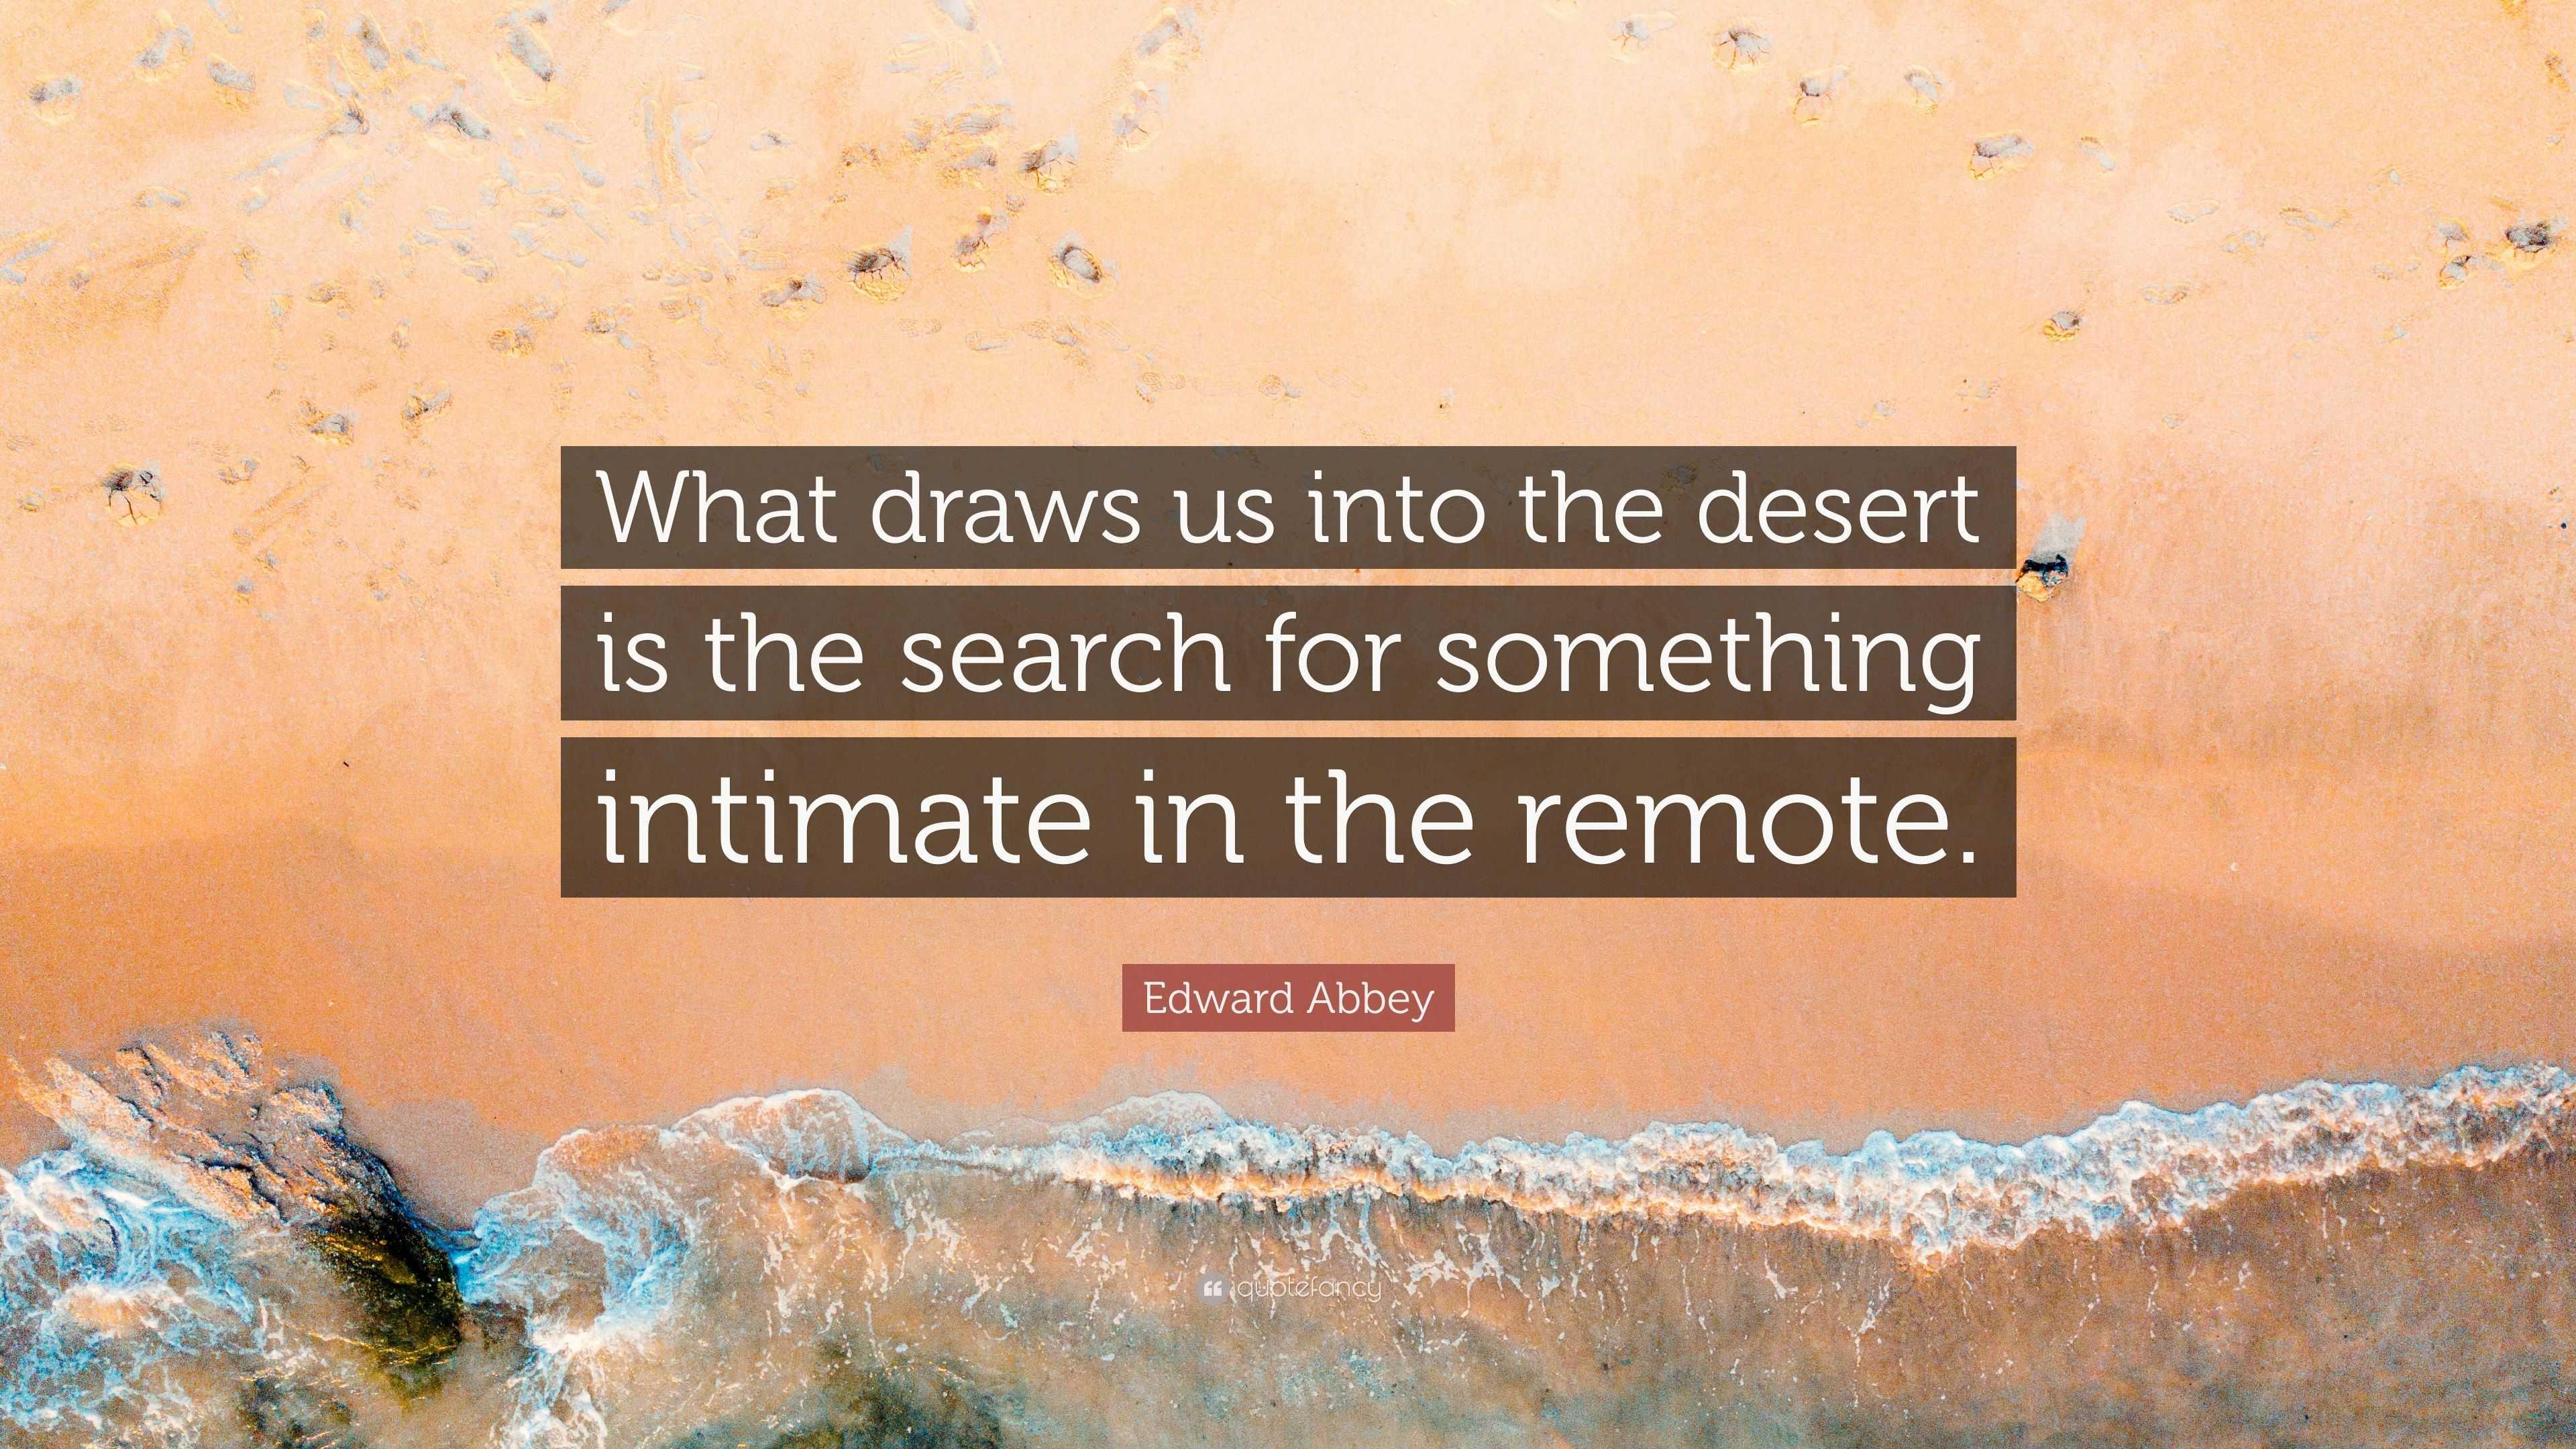 bfc8351c3b6b217edced9b404ab29067.jpg (735×1102 ... |Into The Desert Quotes